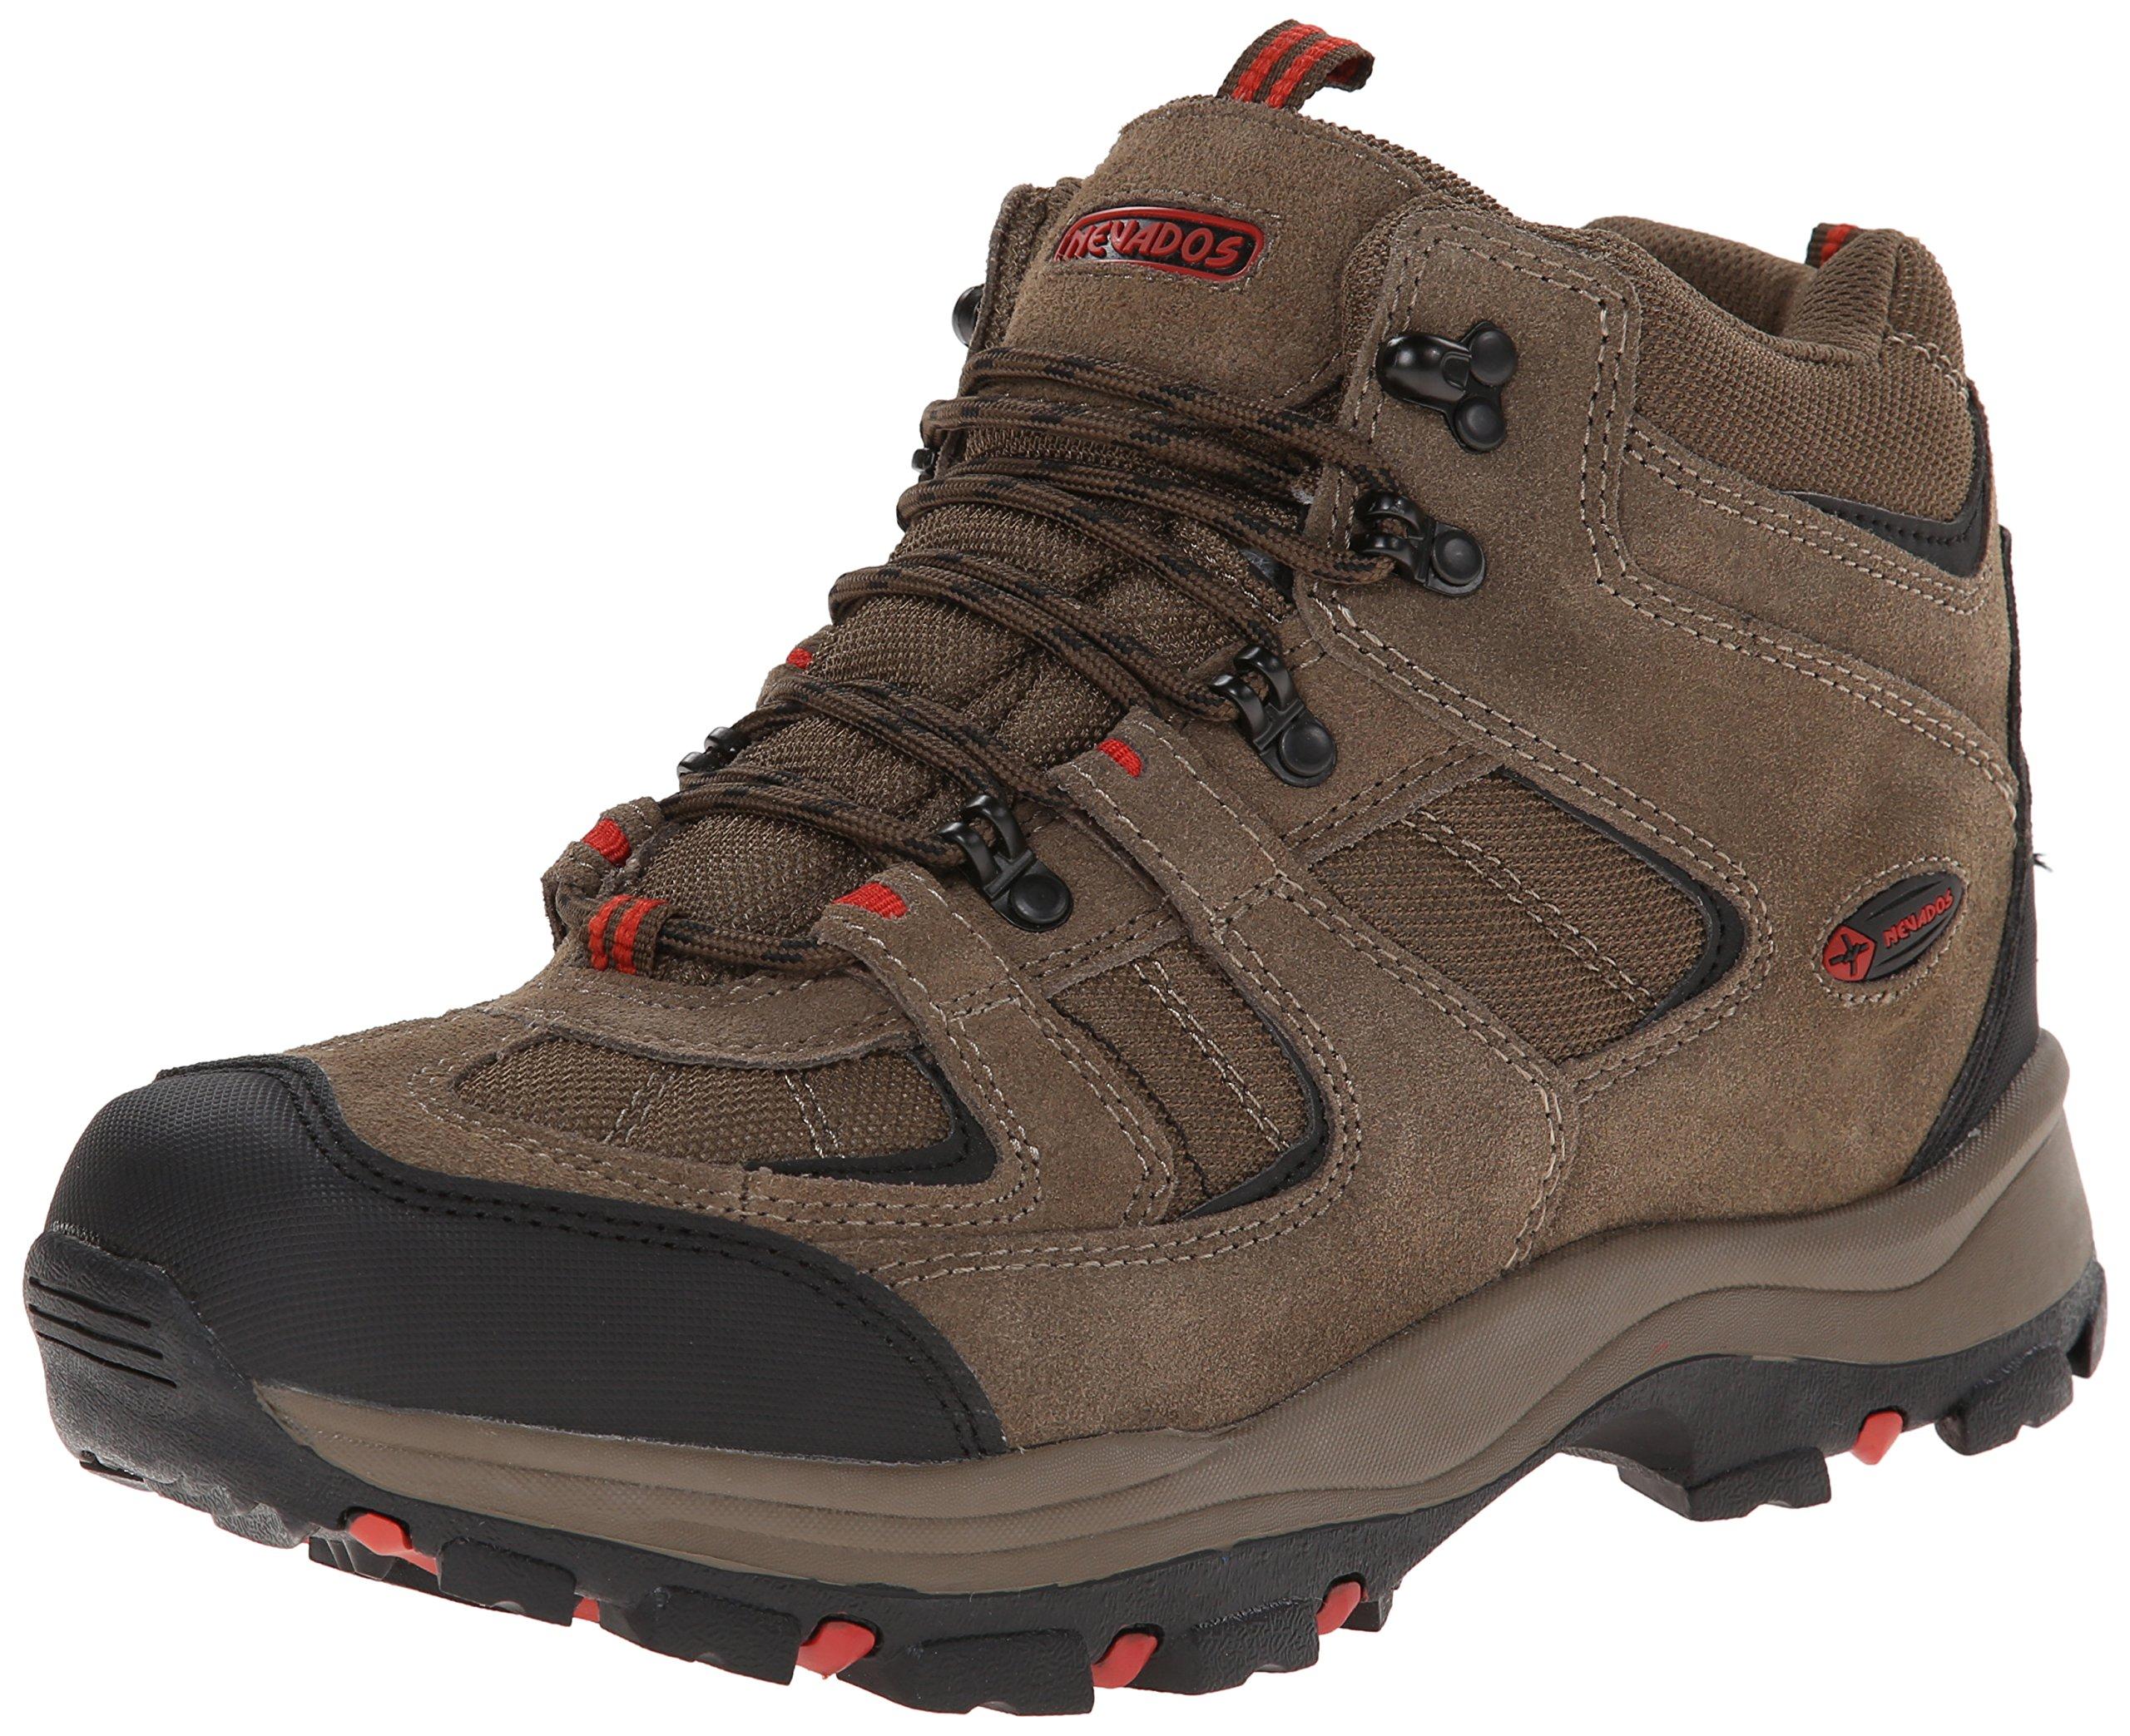 Nevados Men's Boomerang II Mid Hiking Boot, Dark Brown/Red, 8.5 2E US